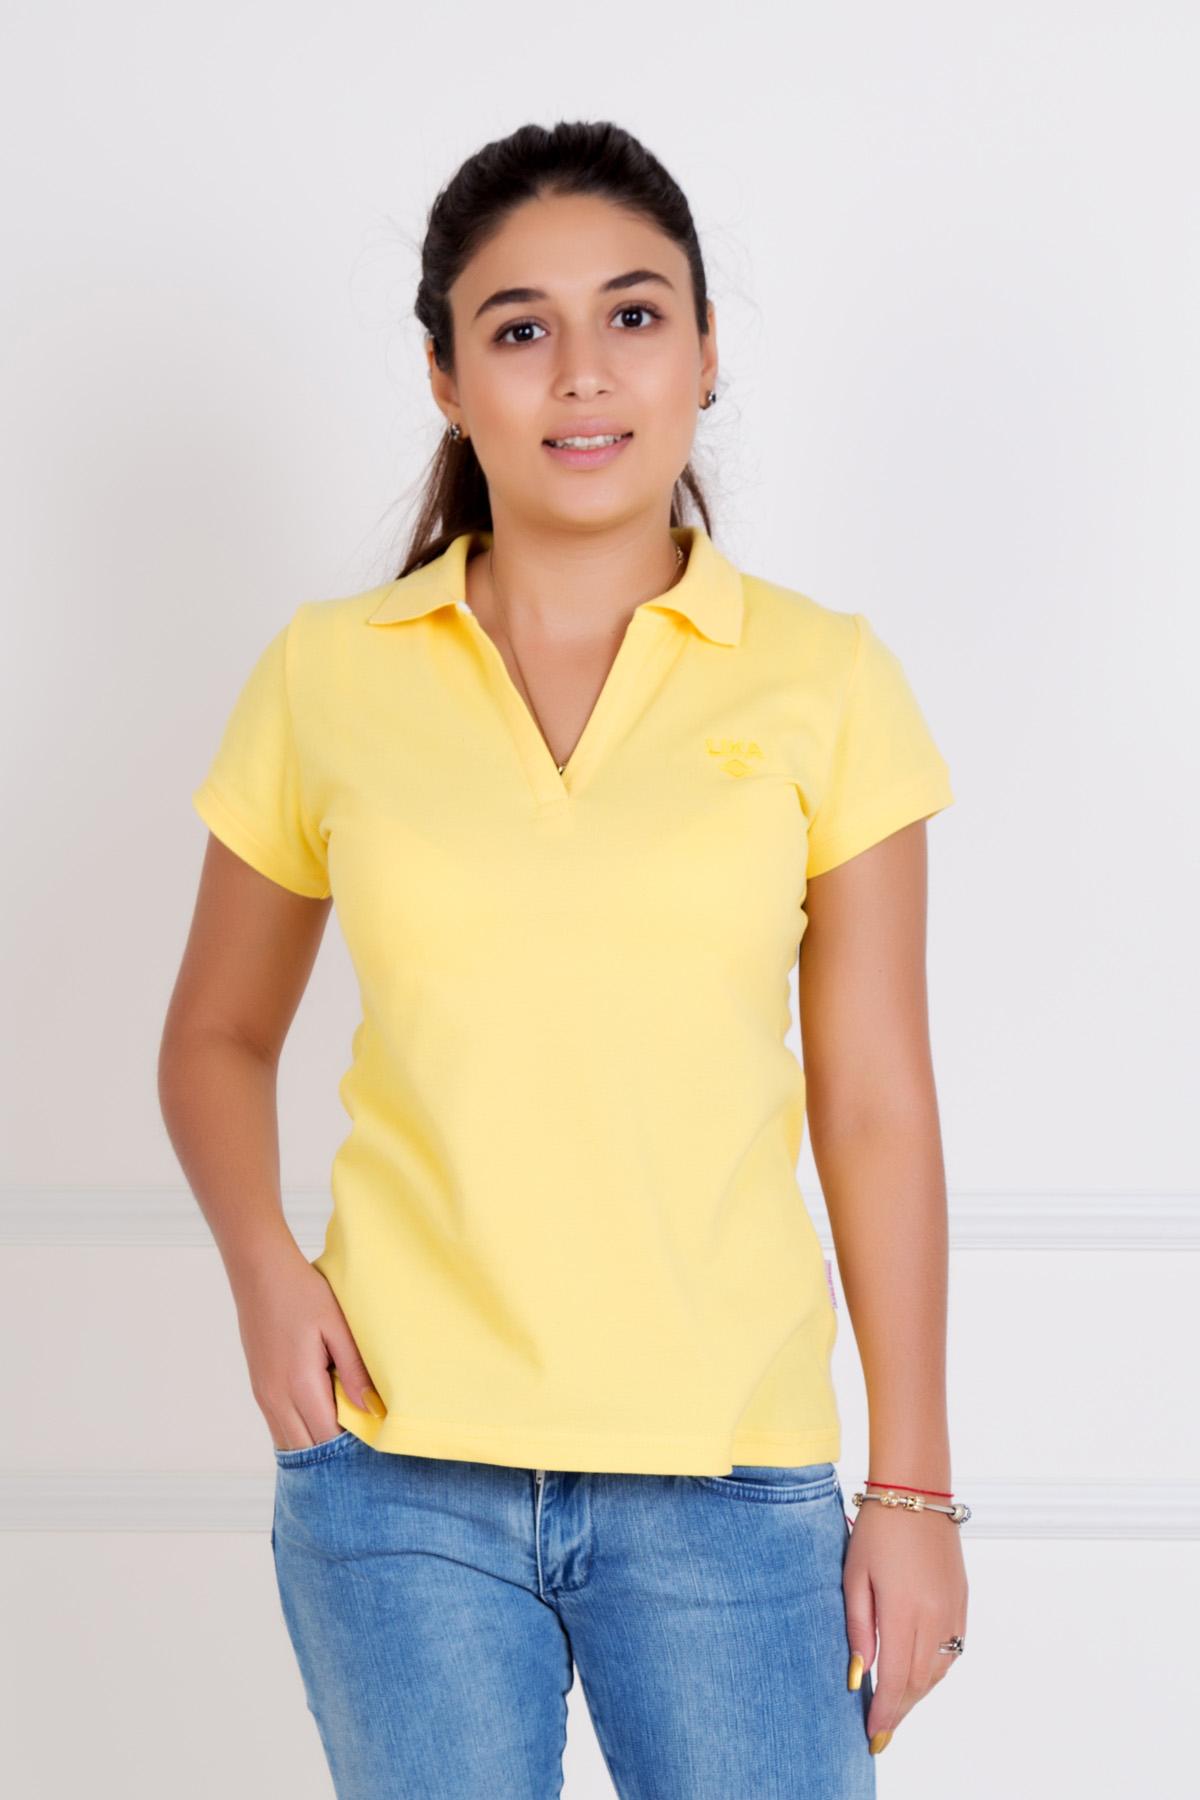 Жен. футболка Шерт Желтый р. 46Майки и футболки<br>Обхват груди:92 см<br>Обхват талии:74 см<br>Обхват бедер:100 см<br>Длина по спинке:61 см<br>Рост:167 см<br><br>Тип: Жен. футболка<br>Размер: 46<br>Материал: Пике